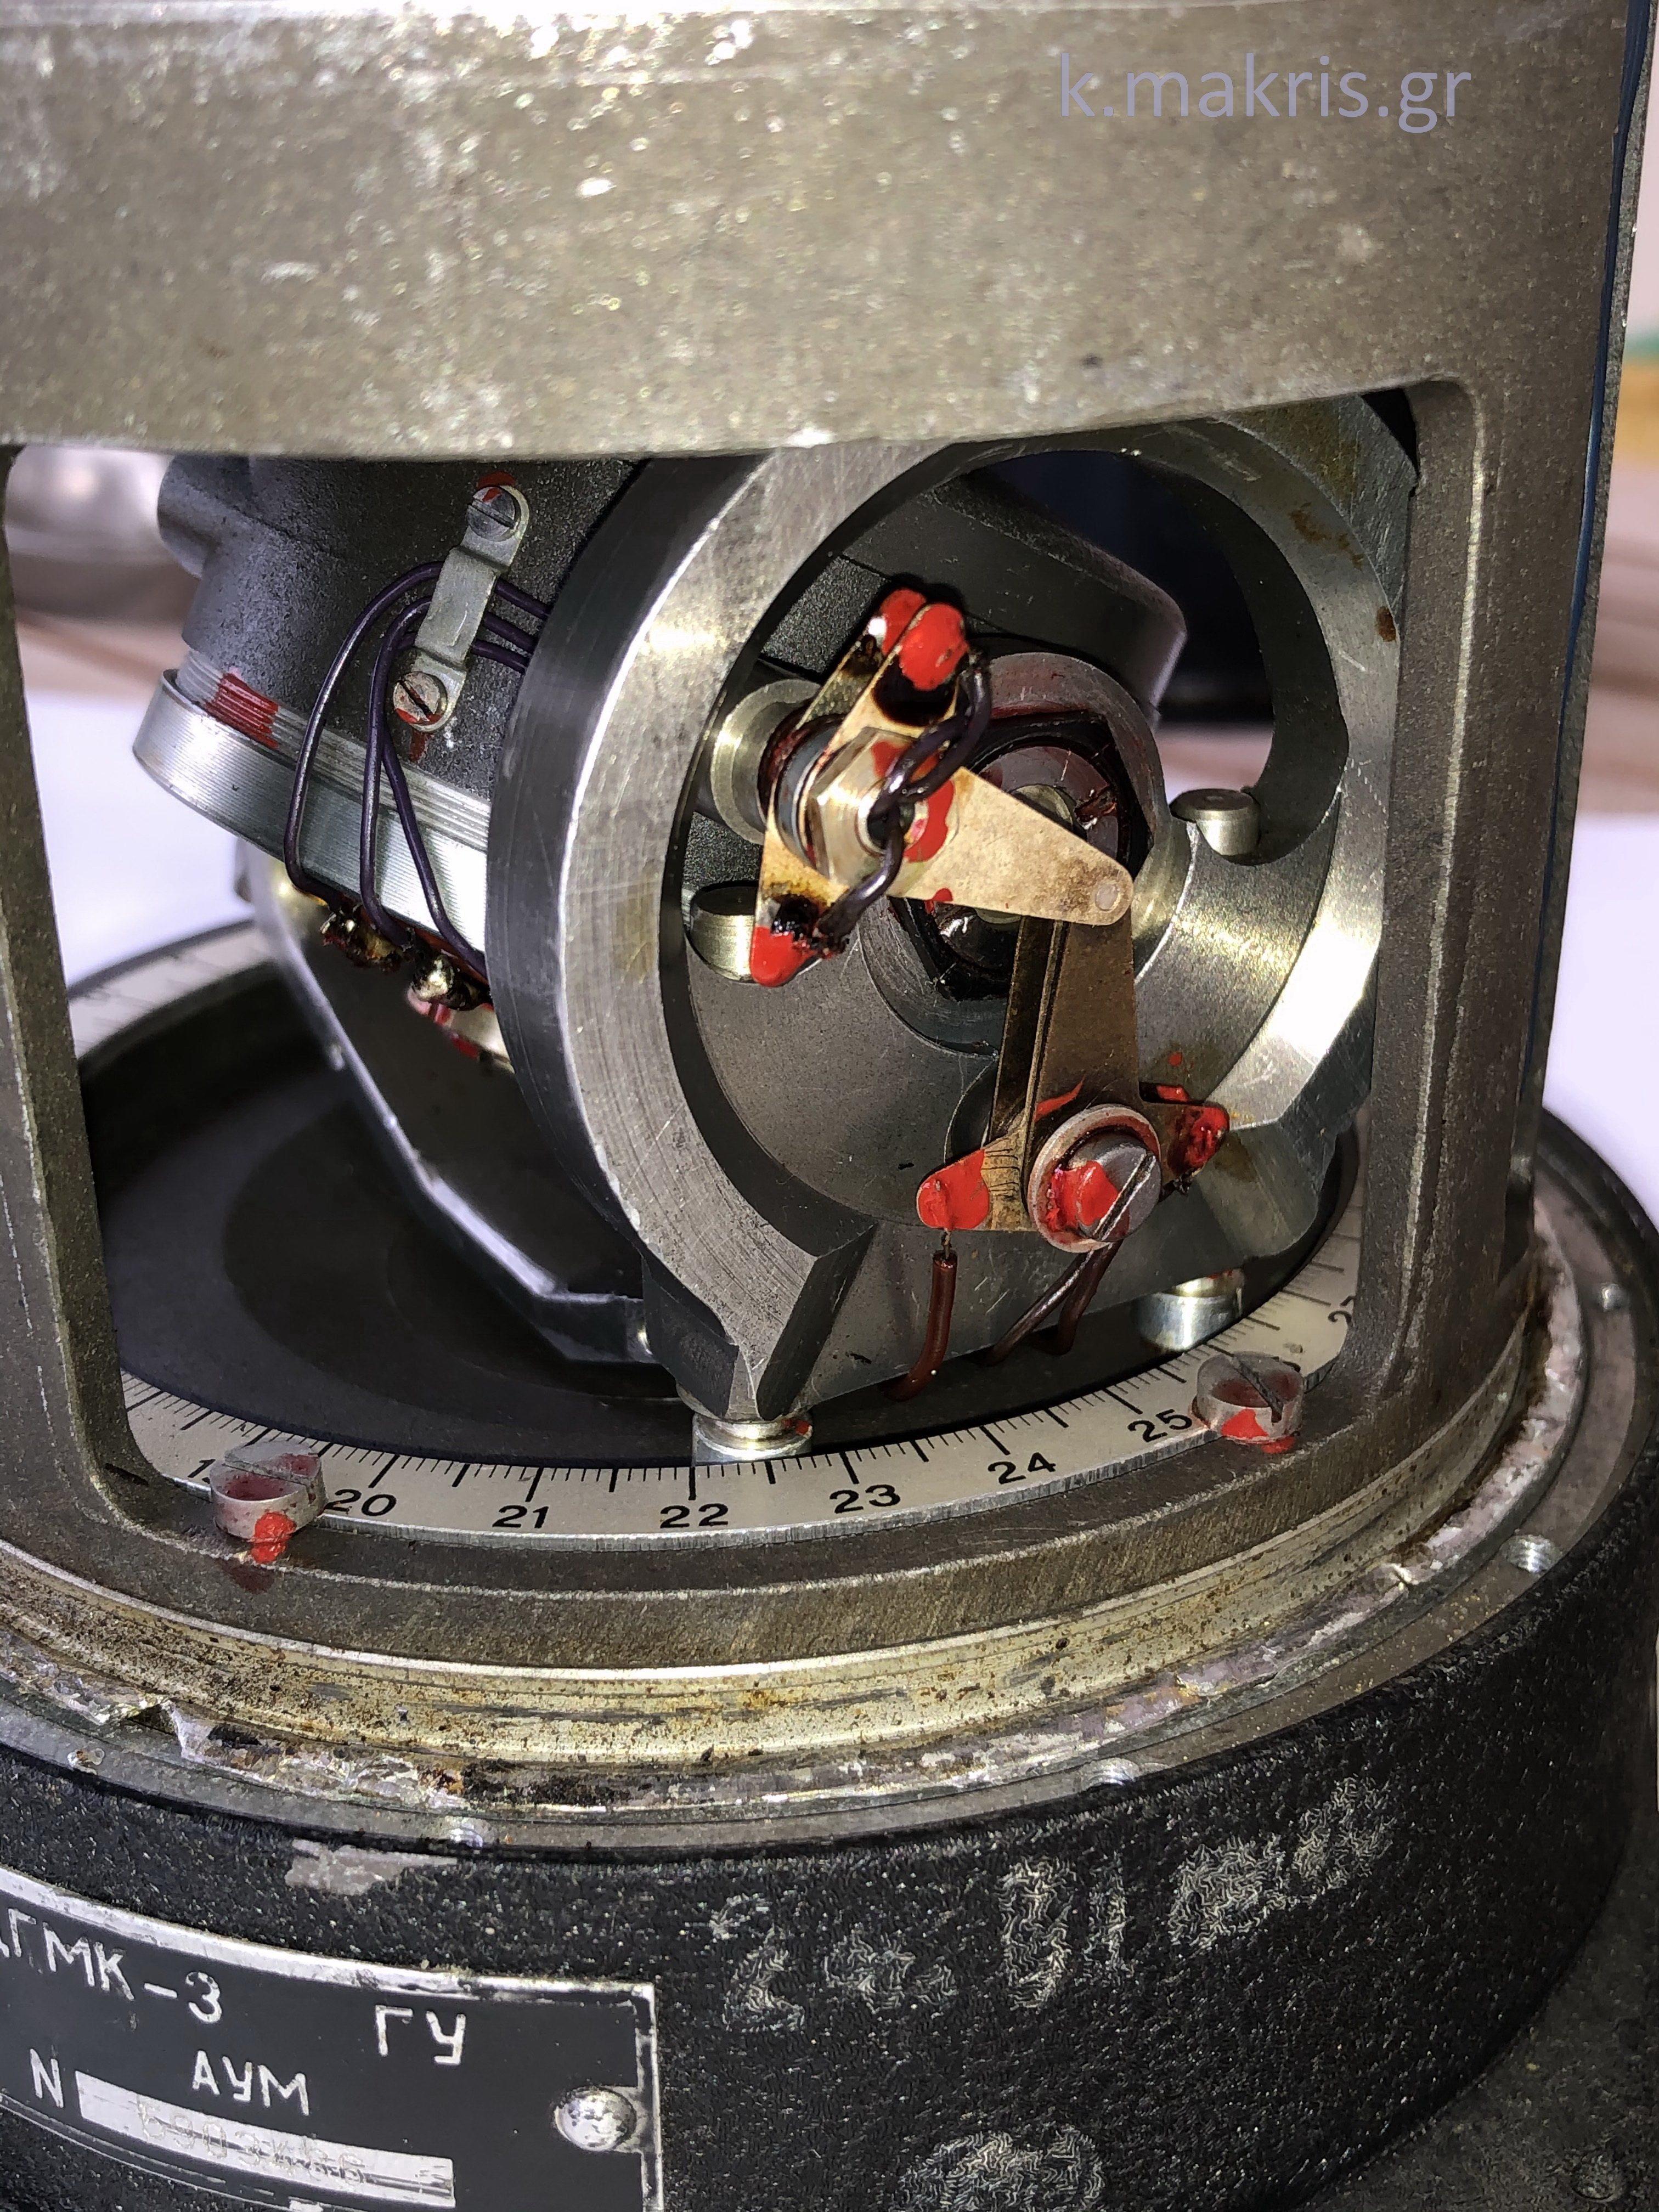 Directional Gyroscope ΑΓΜΚ-3 ΓΥ